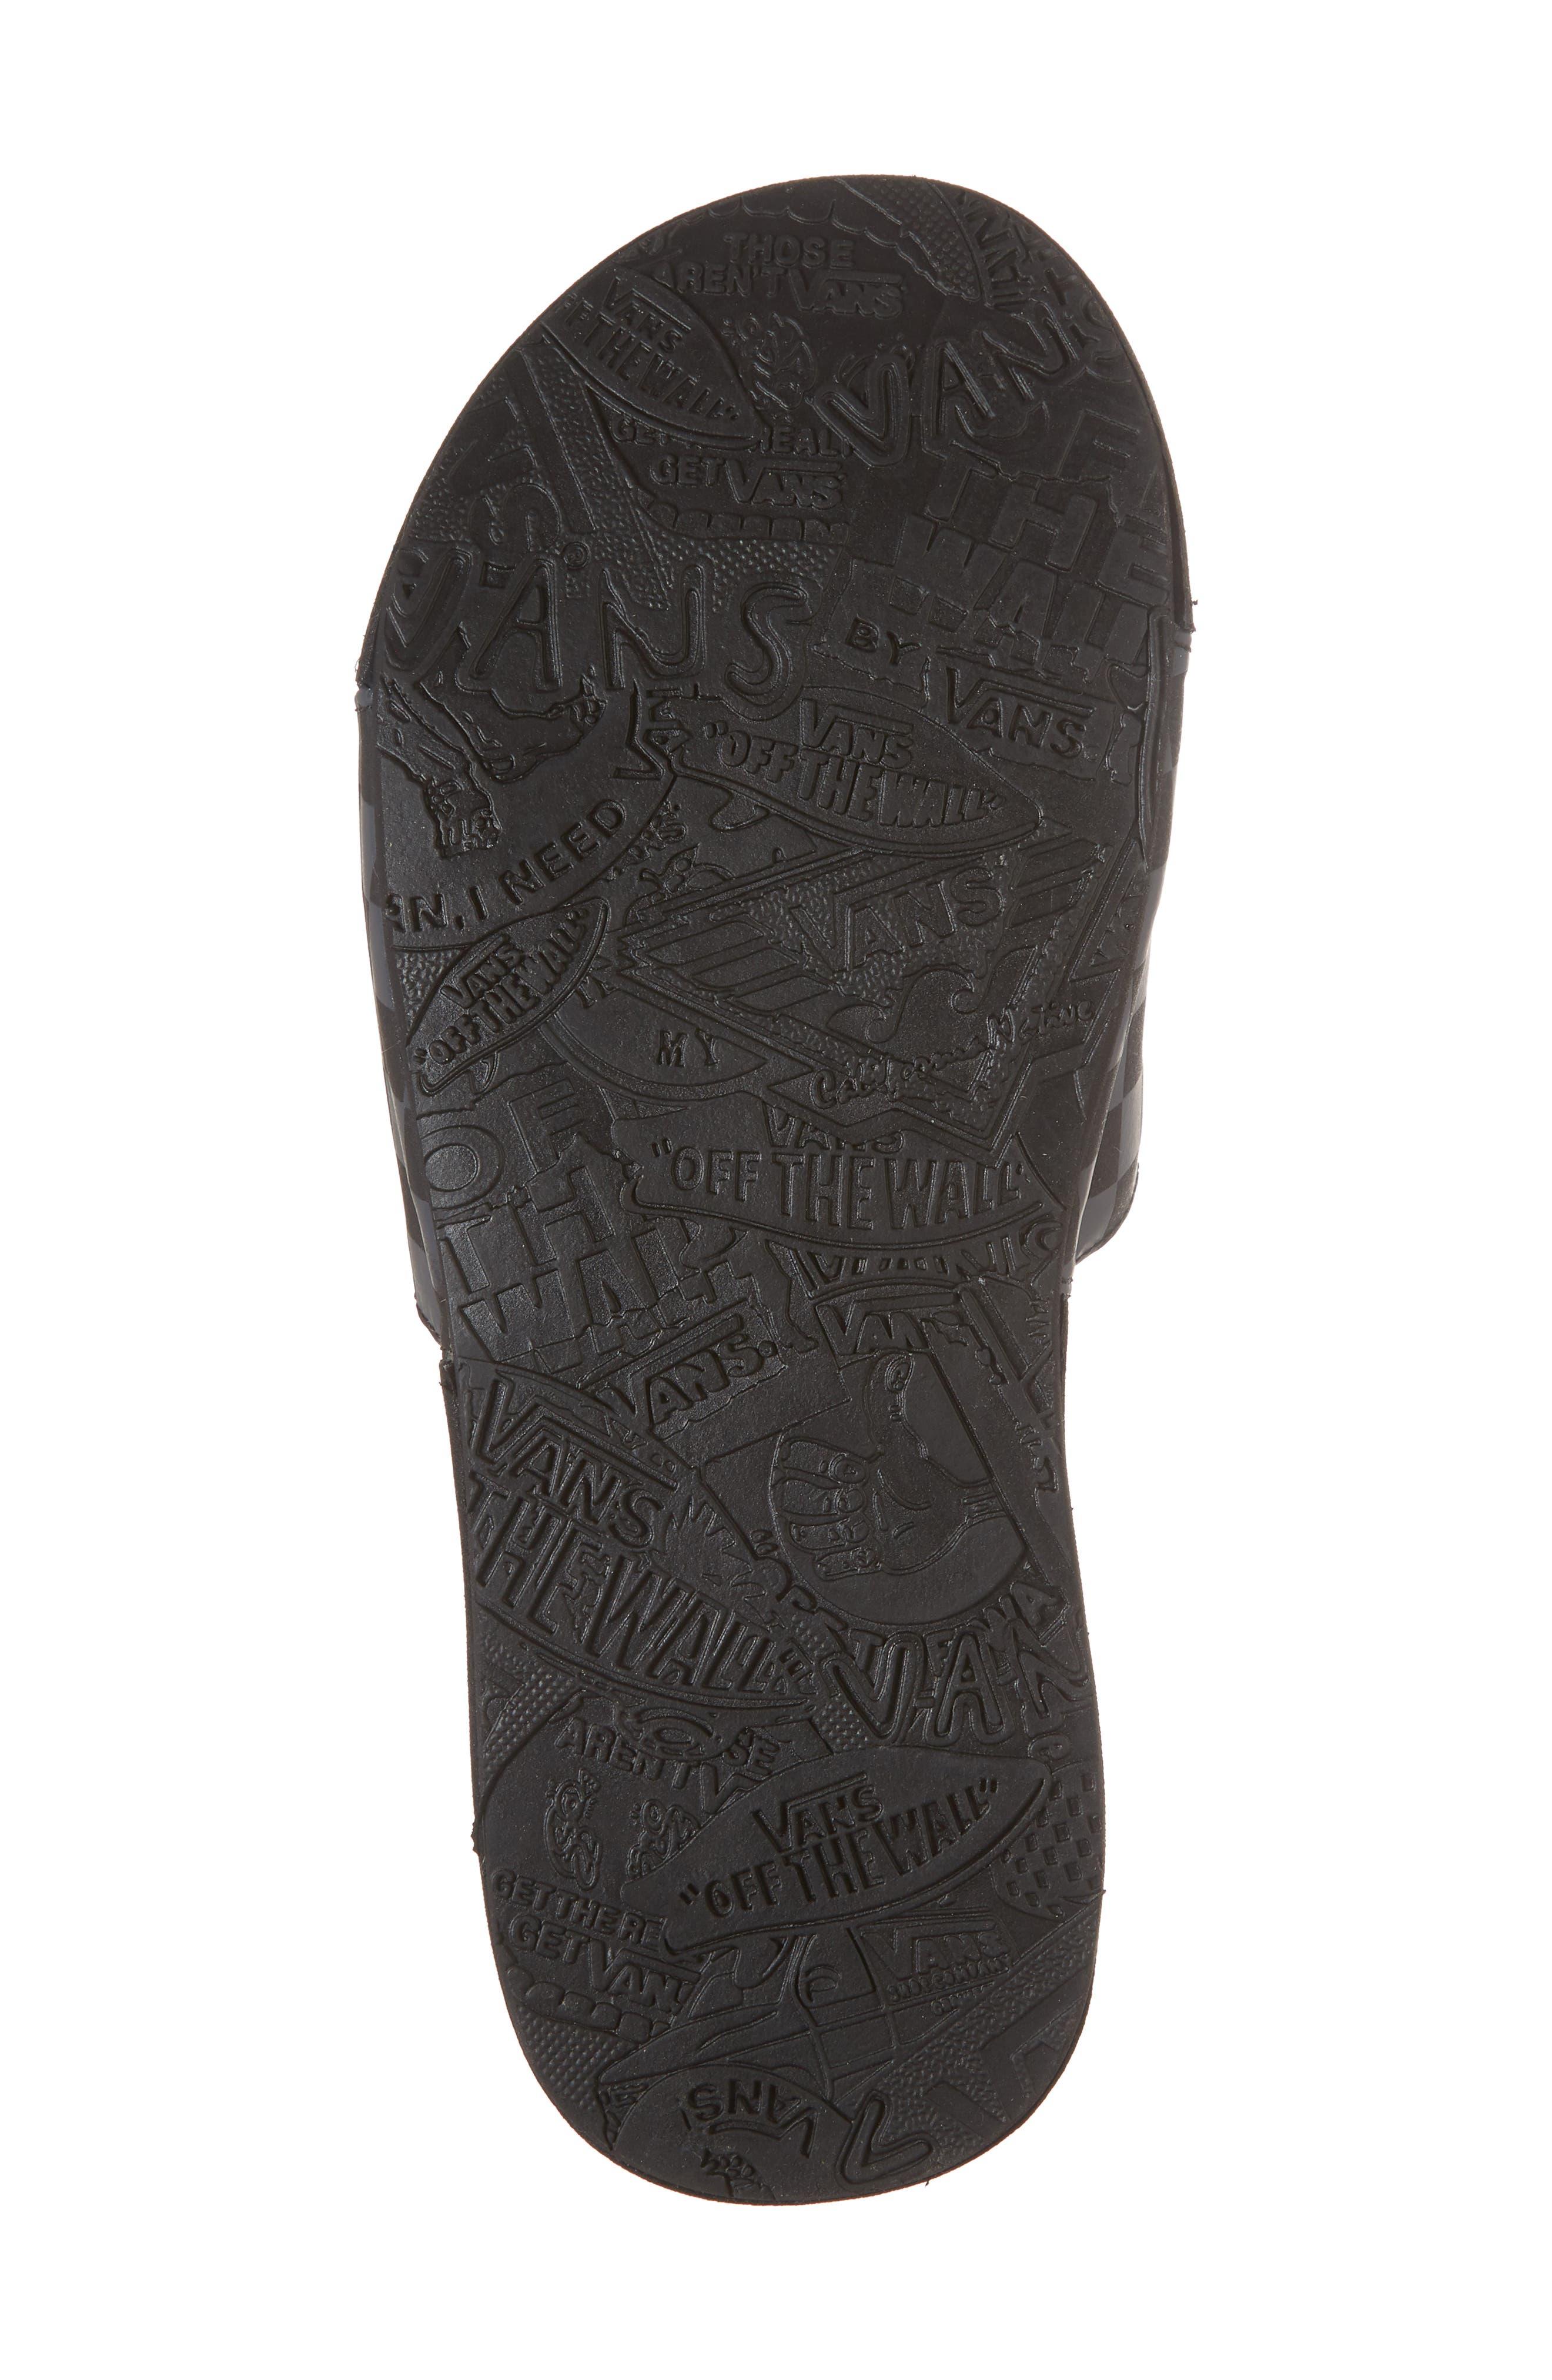 Nexpa Slide Sandal,                             Alternate thumbnail 6, color,                             Black/ Asphalt